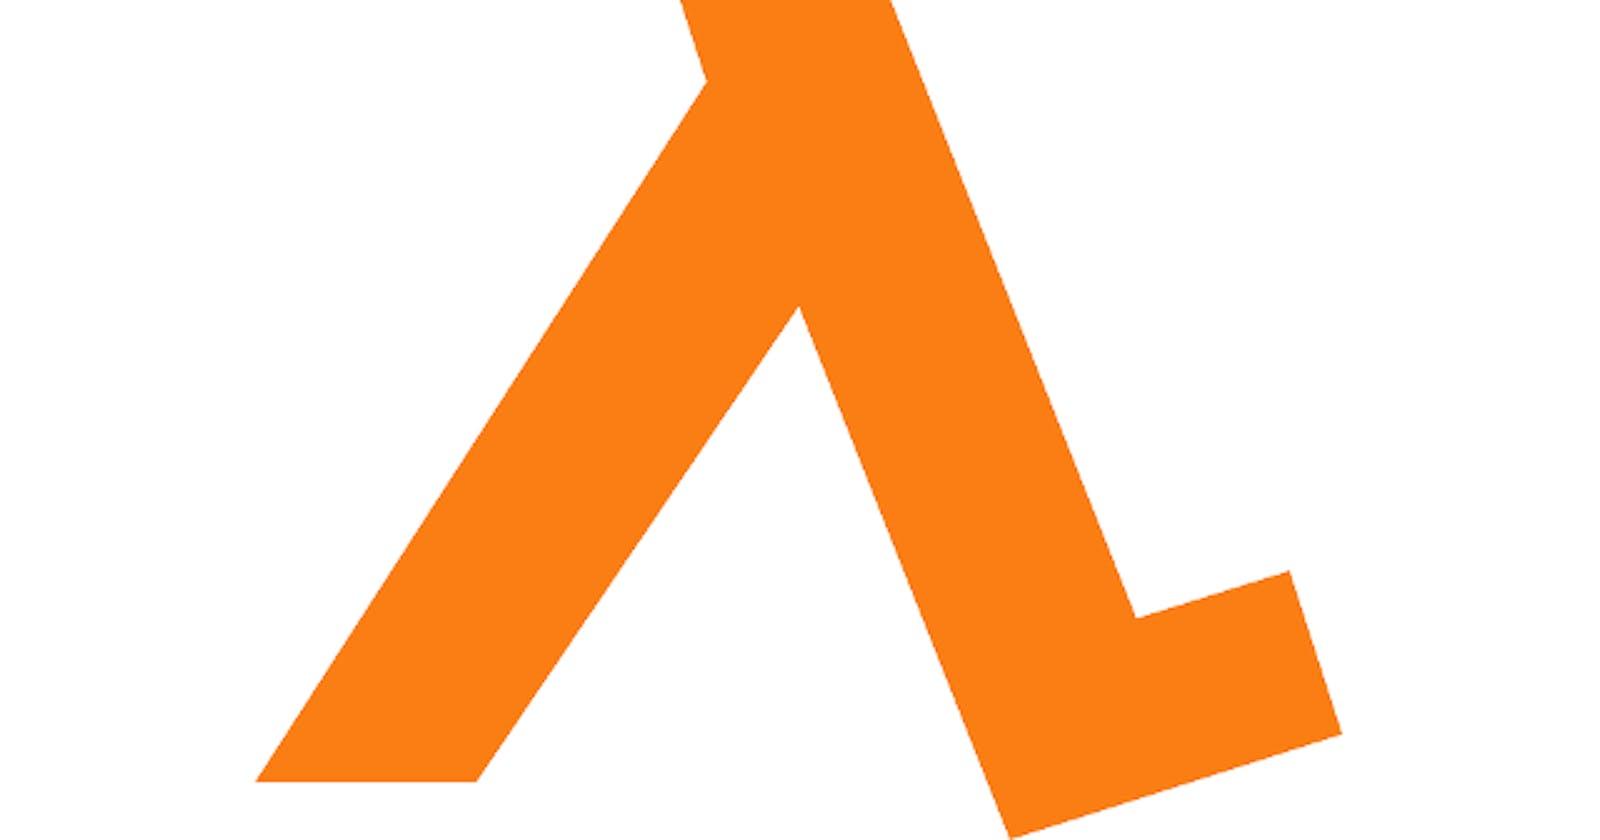 Creating Thumbnails with AWS Lambda and NodeJS Part 1